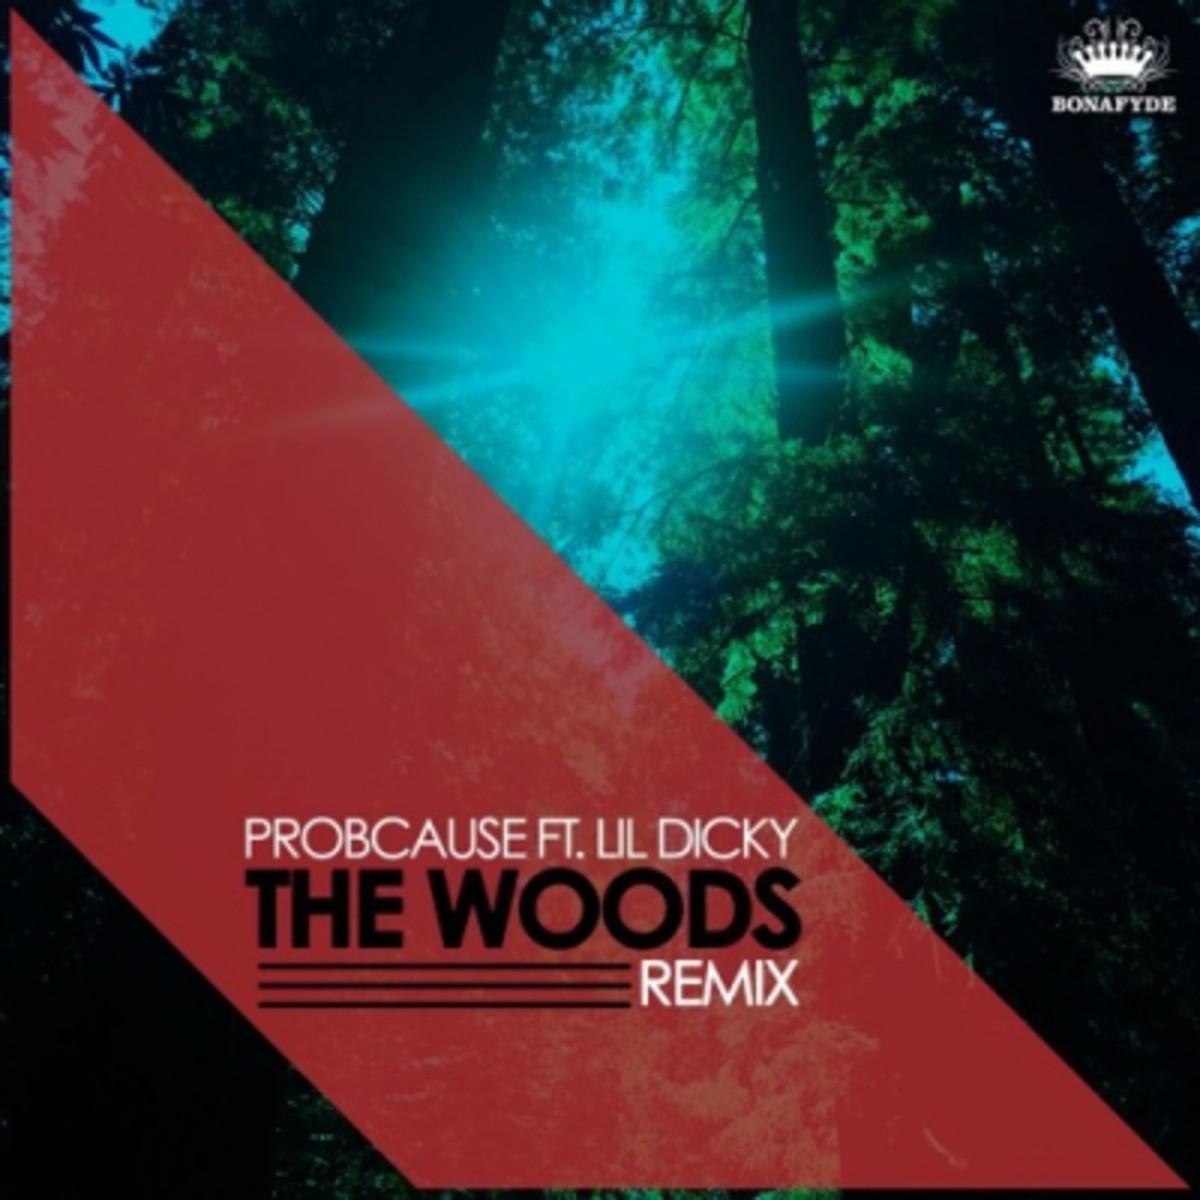 probcause-the-woods-remix.jpg